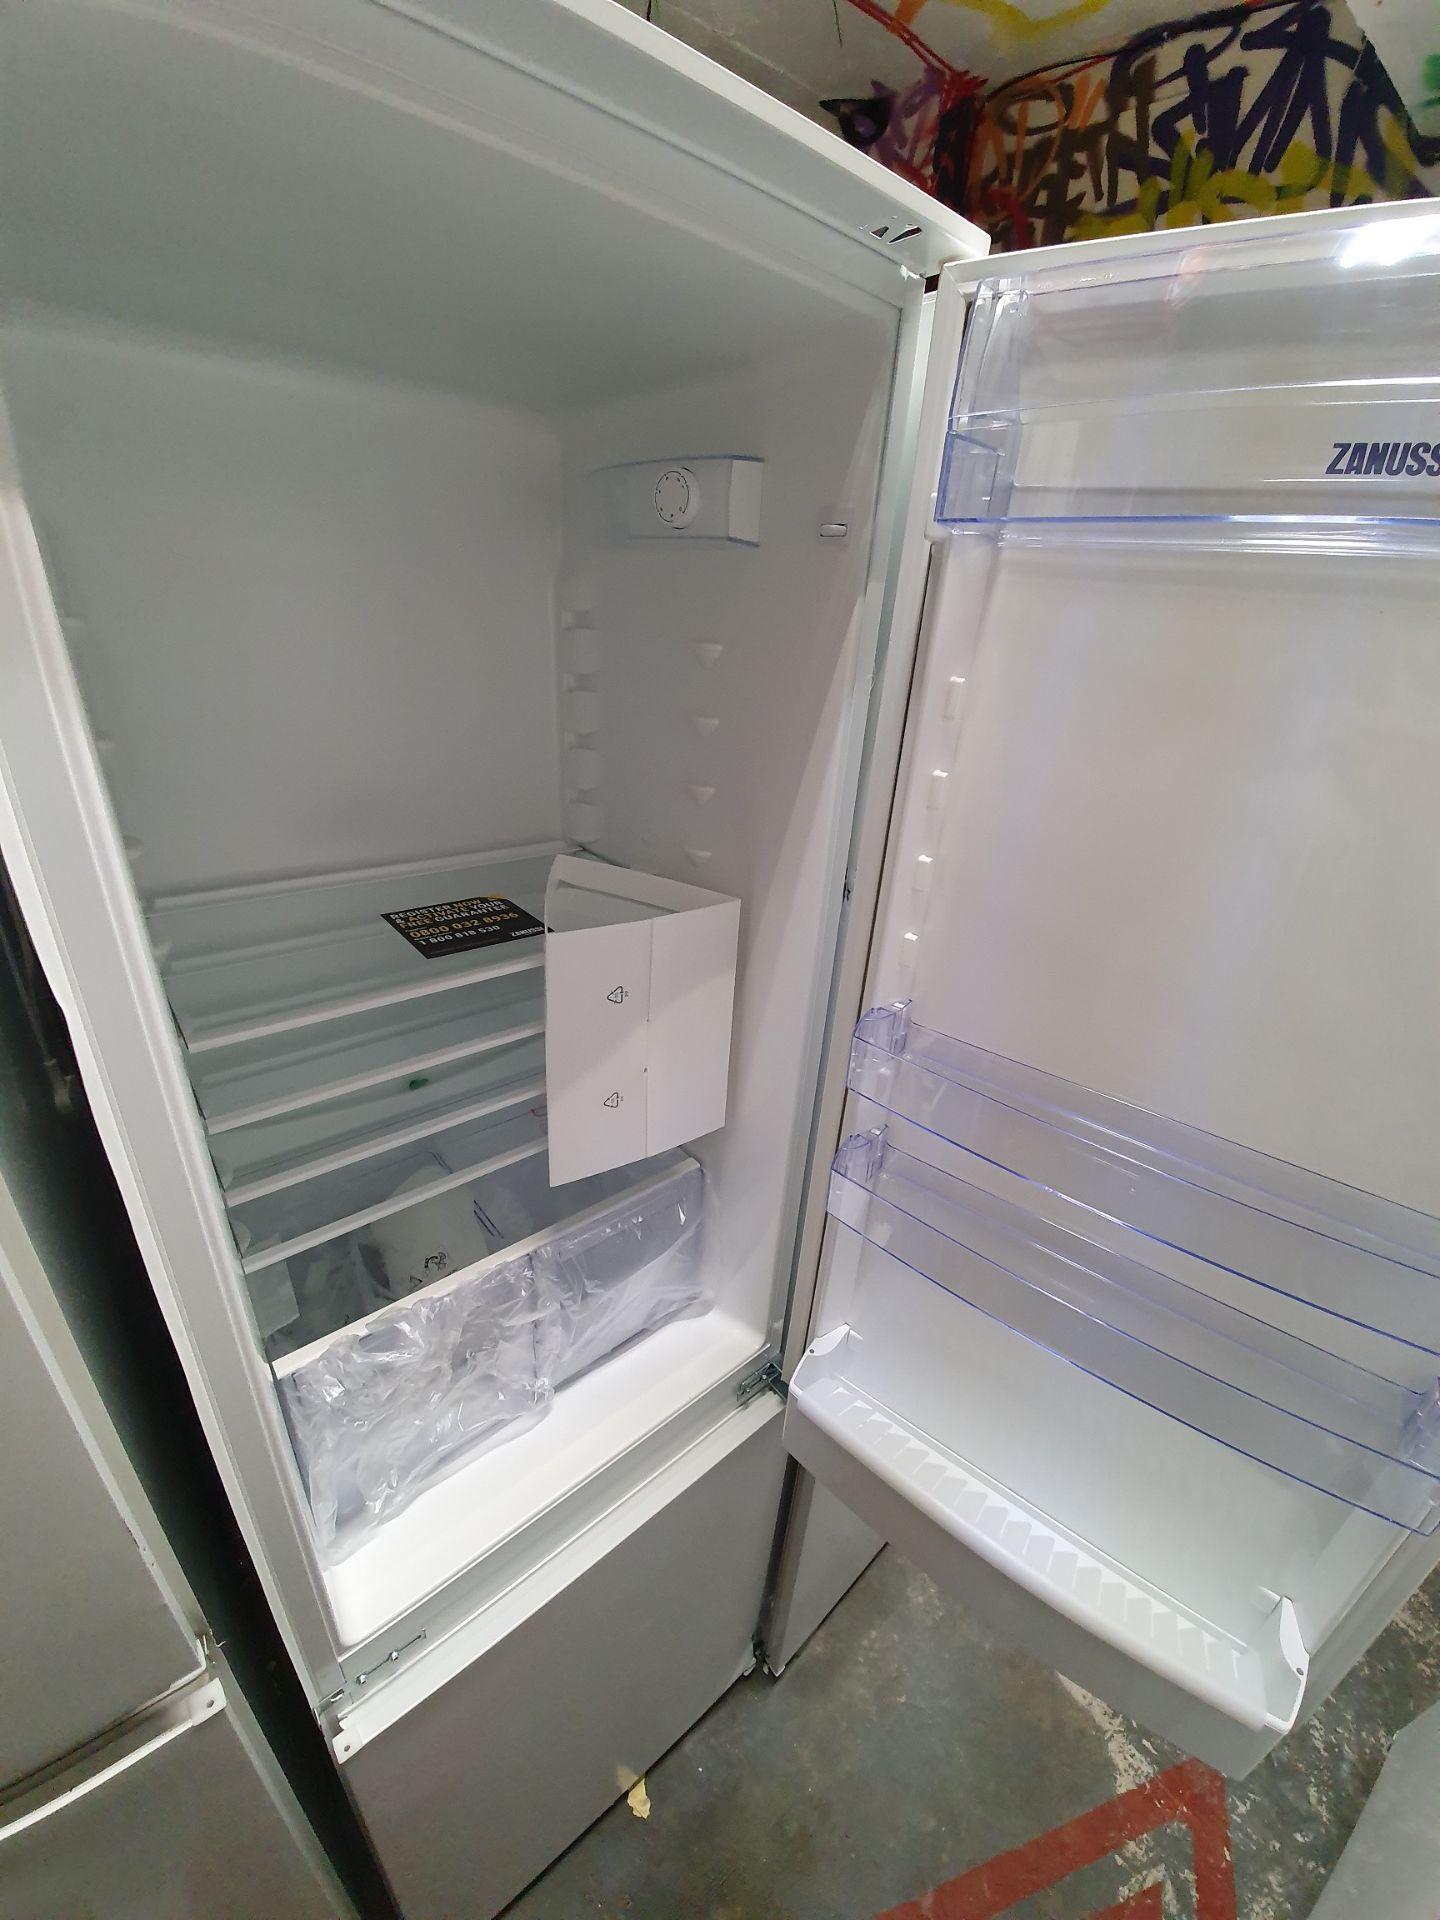 NEW/GRADED AND UNPACKAGED Beko BSCD150 Integrated 50/50 Fridge Freezer (Brand new slight external - Image 9 of 14